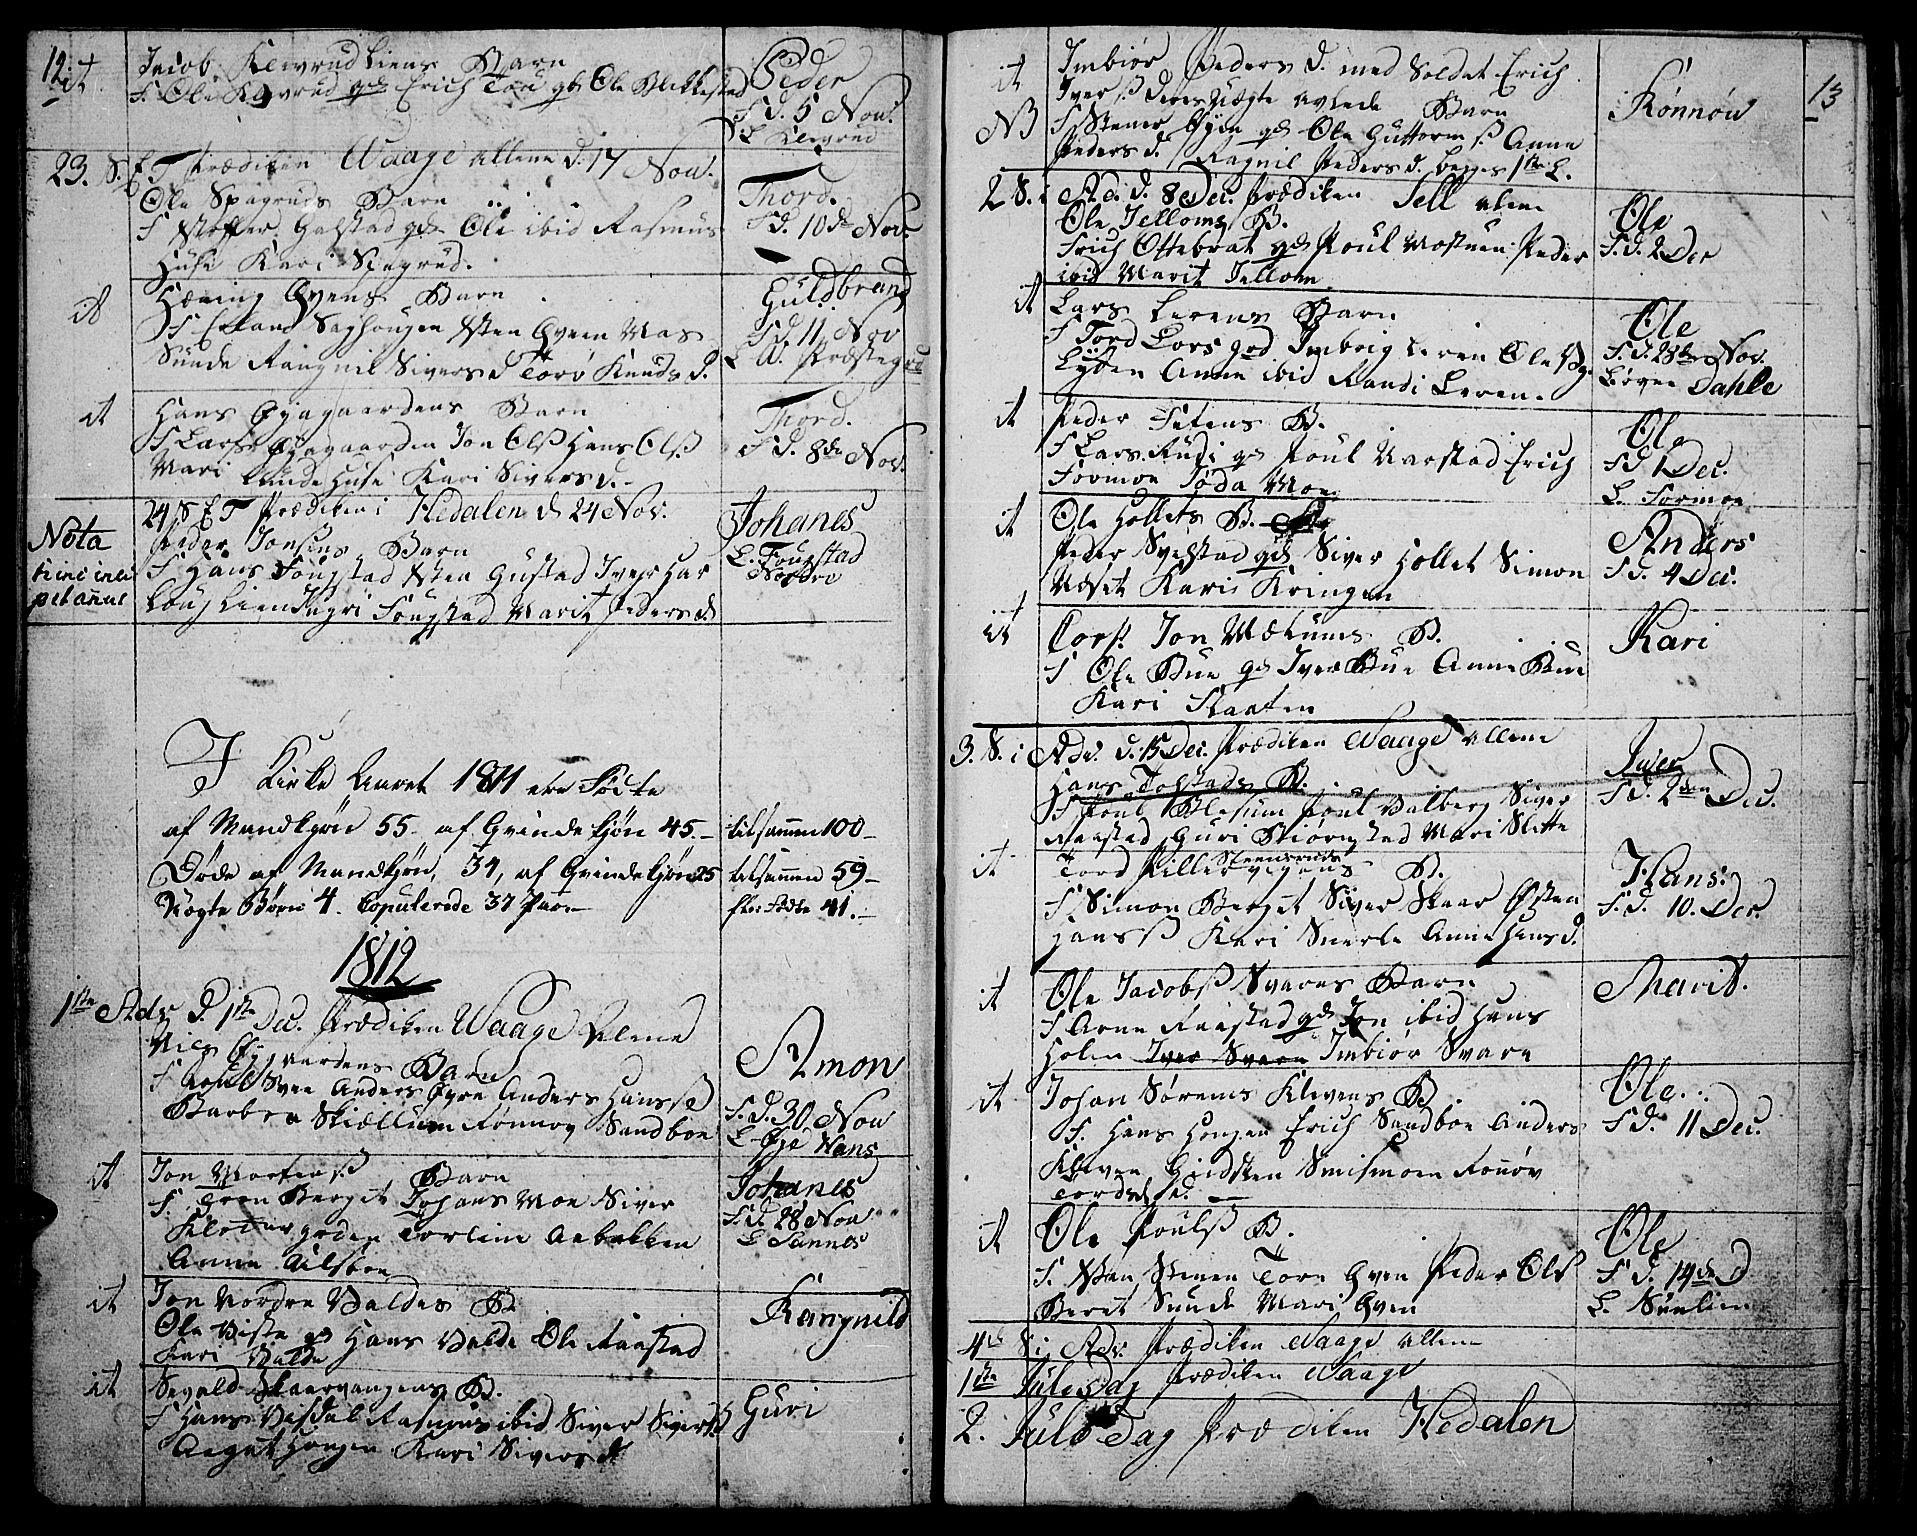 SAH, Vågå prestekontor, Ministerialbok nr. 2, 1810-1815, s. 12-13